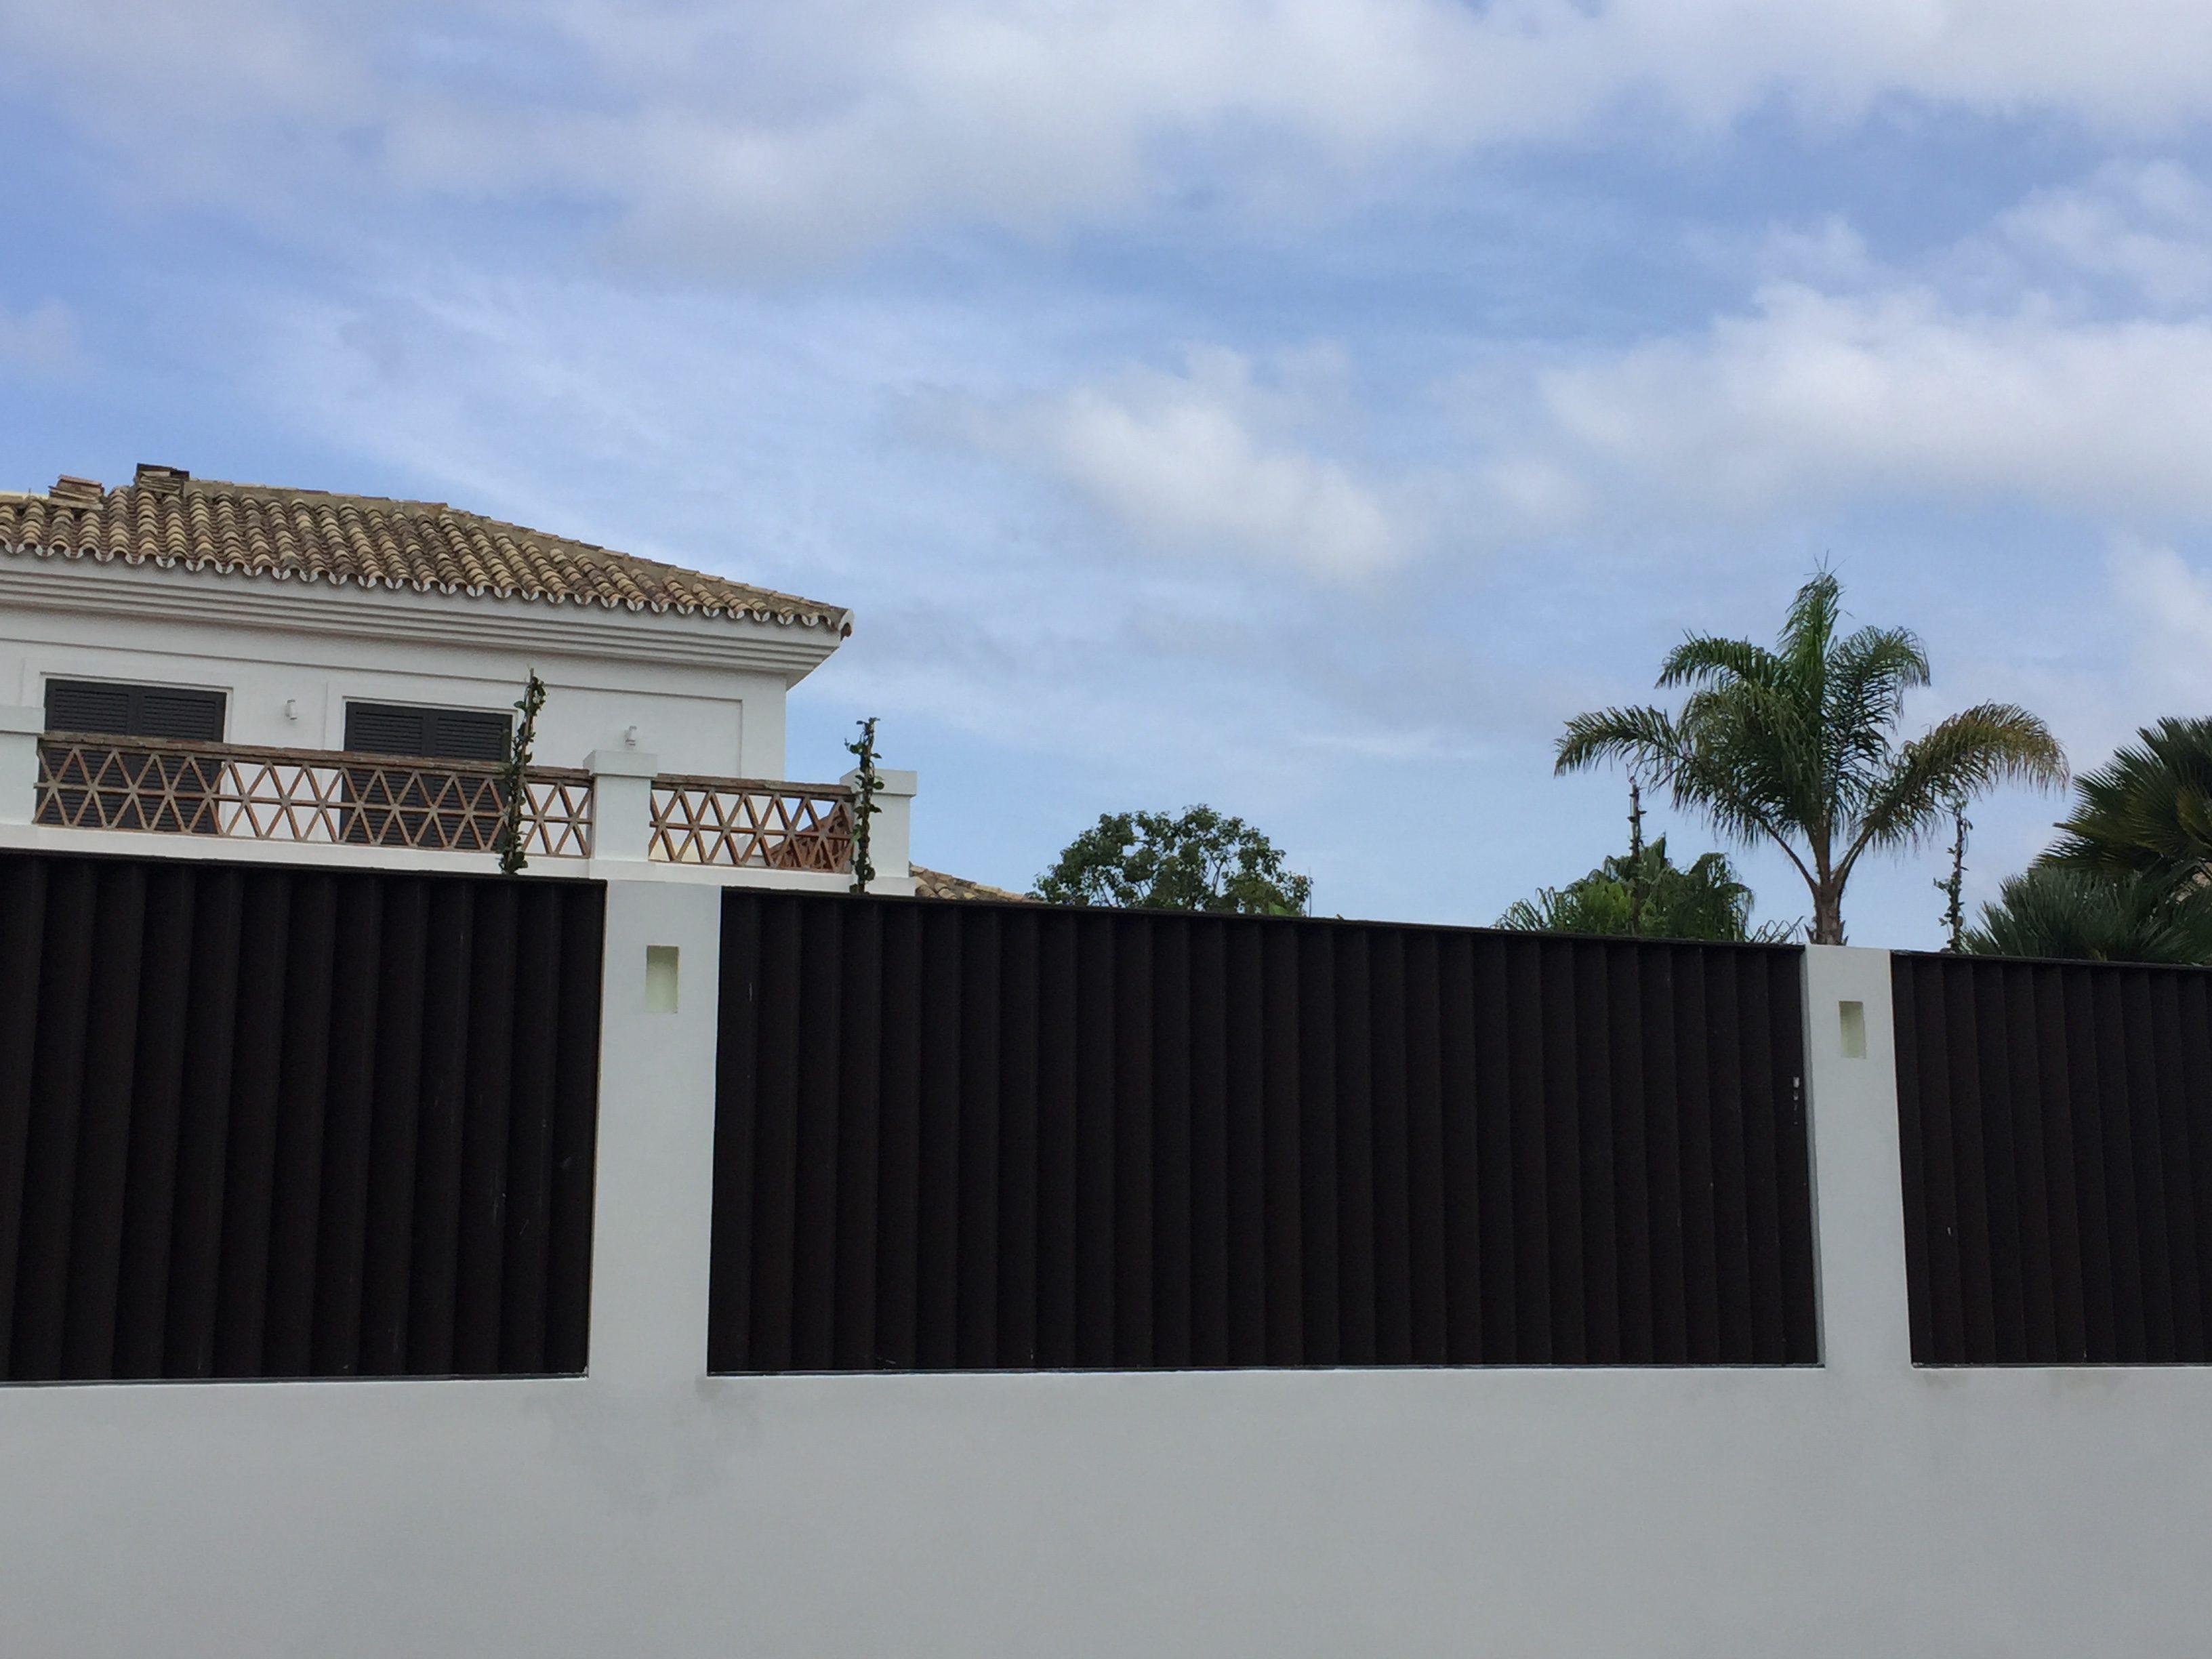 Fence-4-e1615997346871